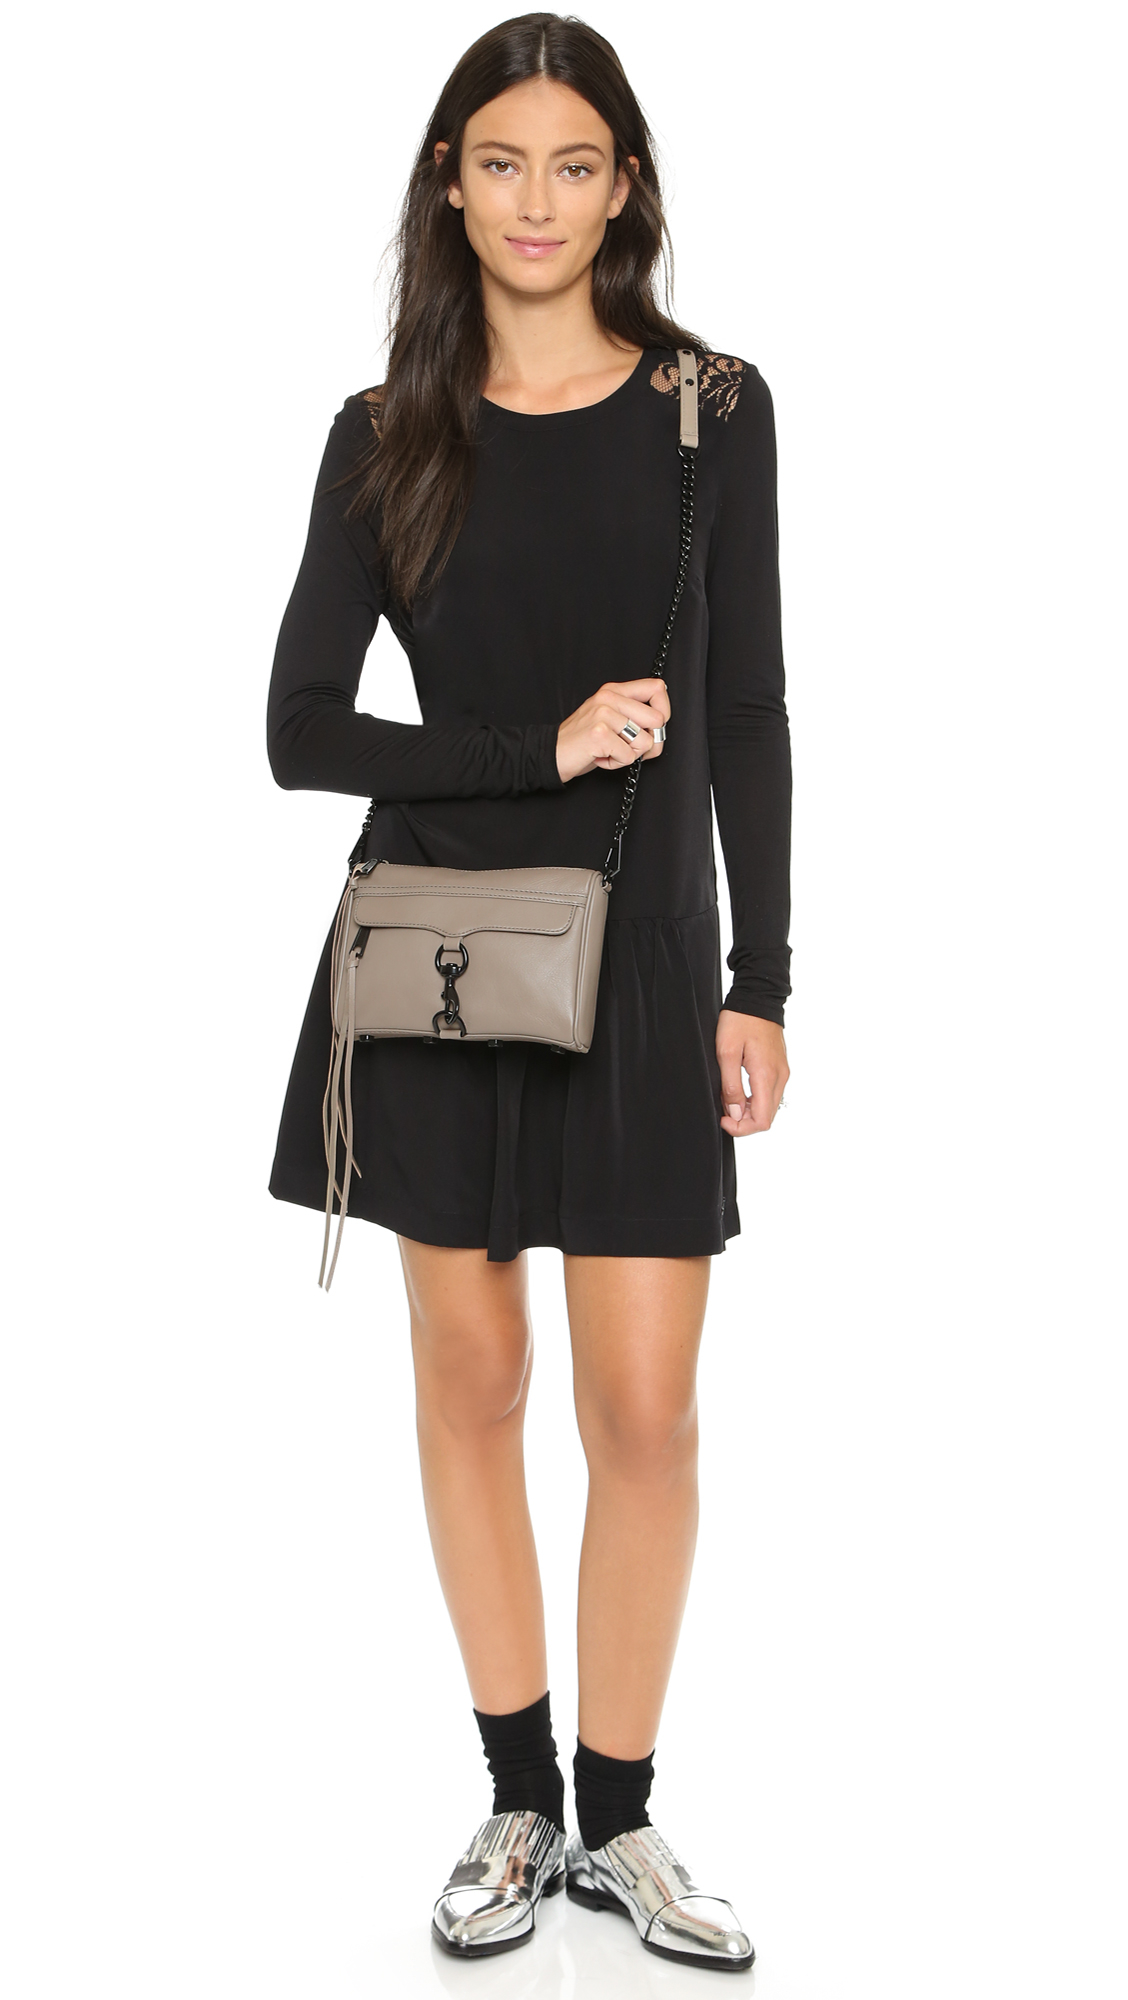 Rebecca Minkoff Mini Mac Leather Shoulder Bag In